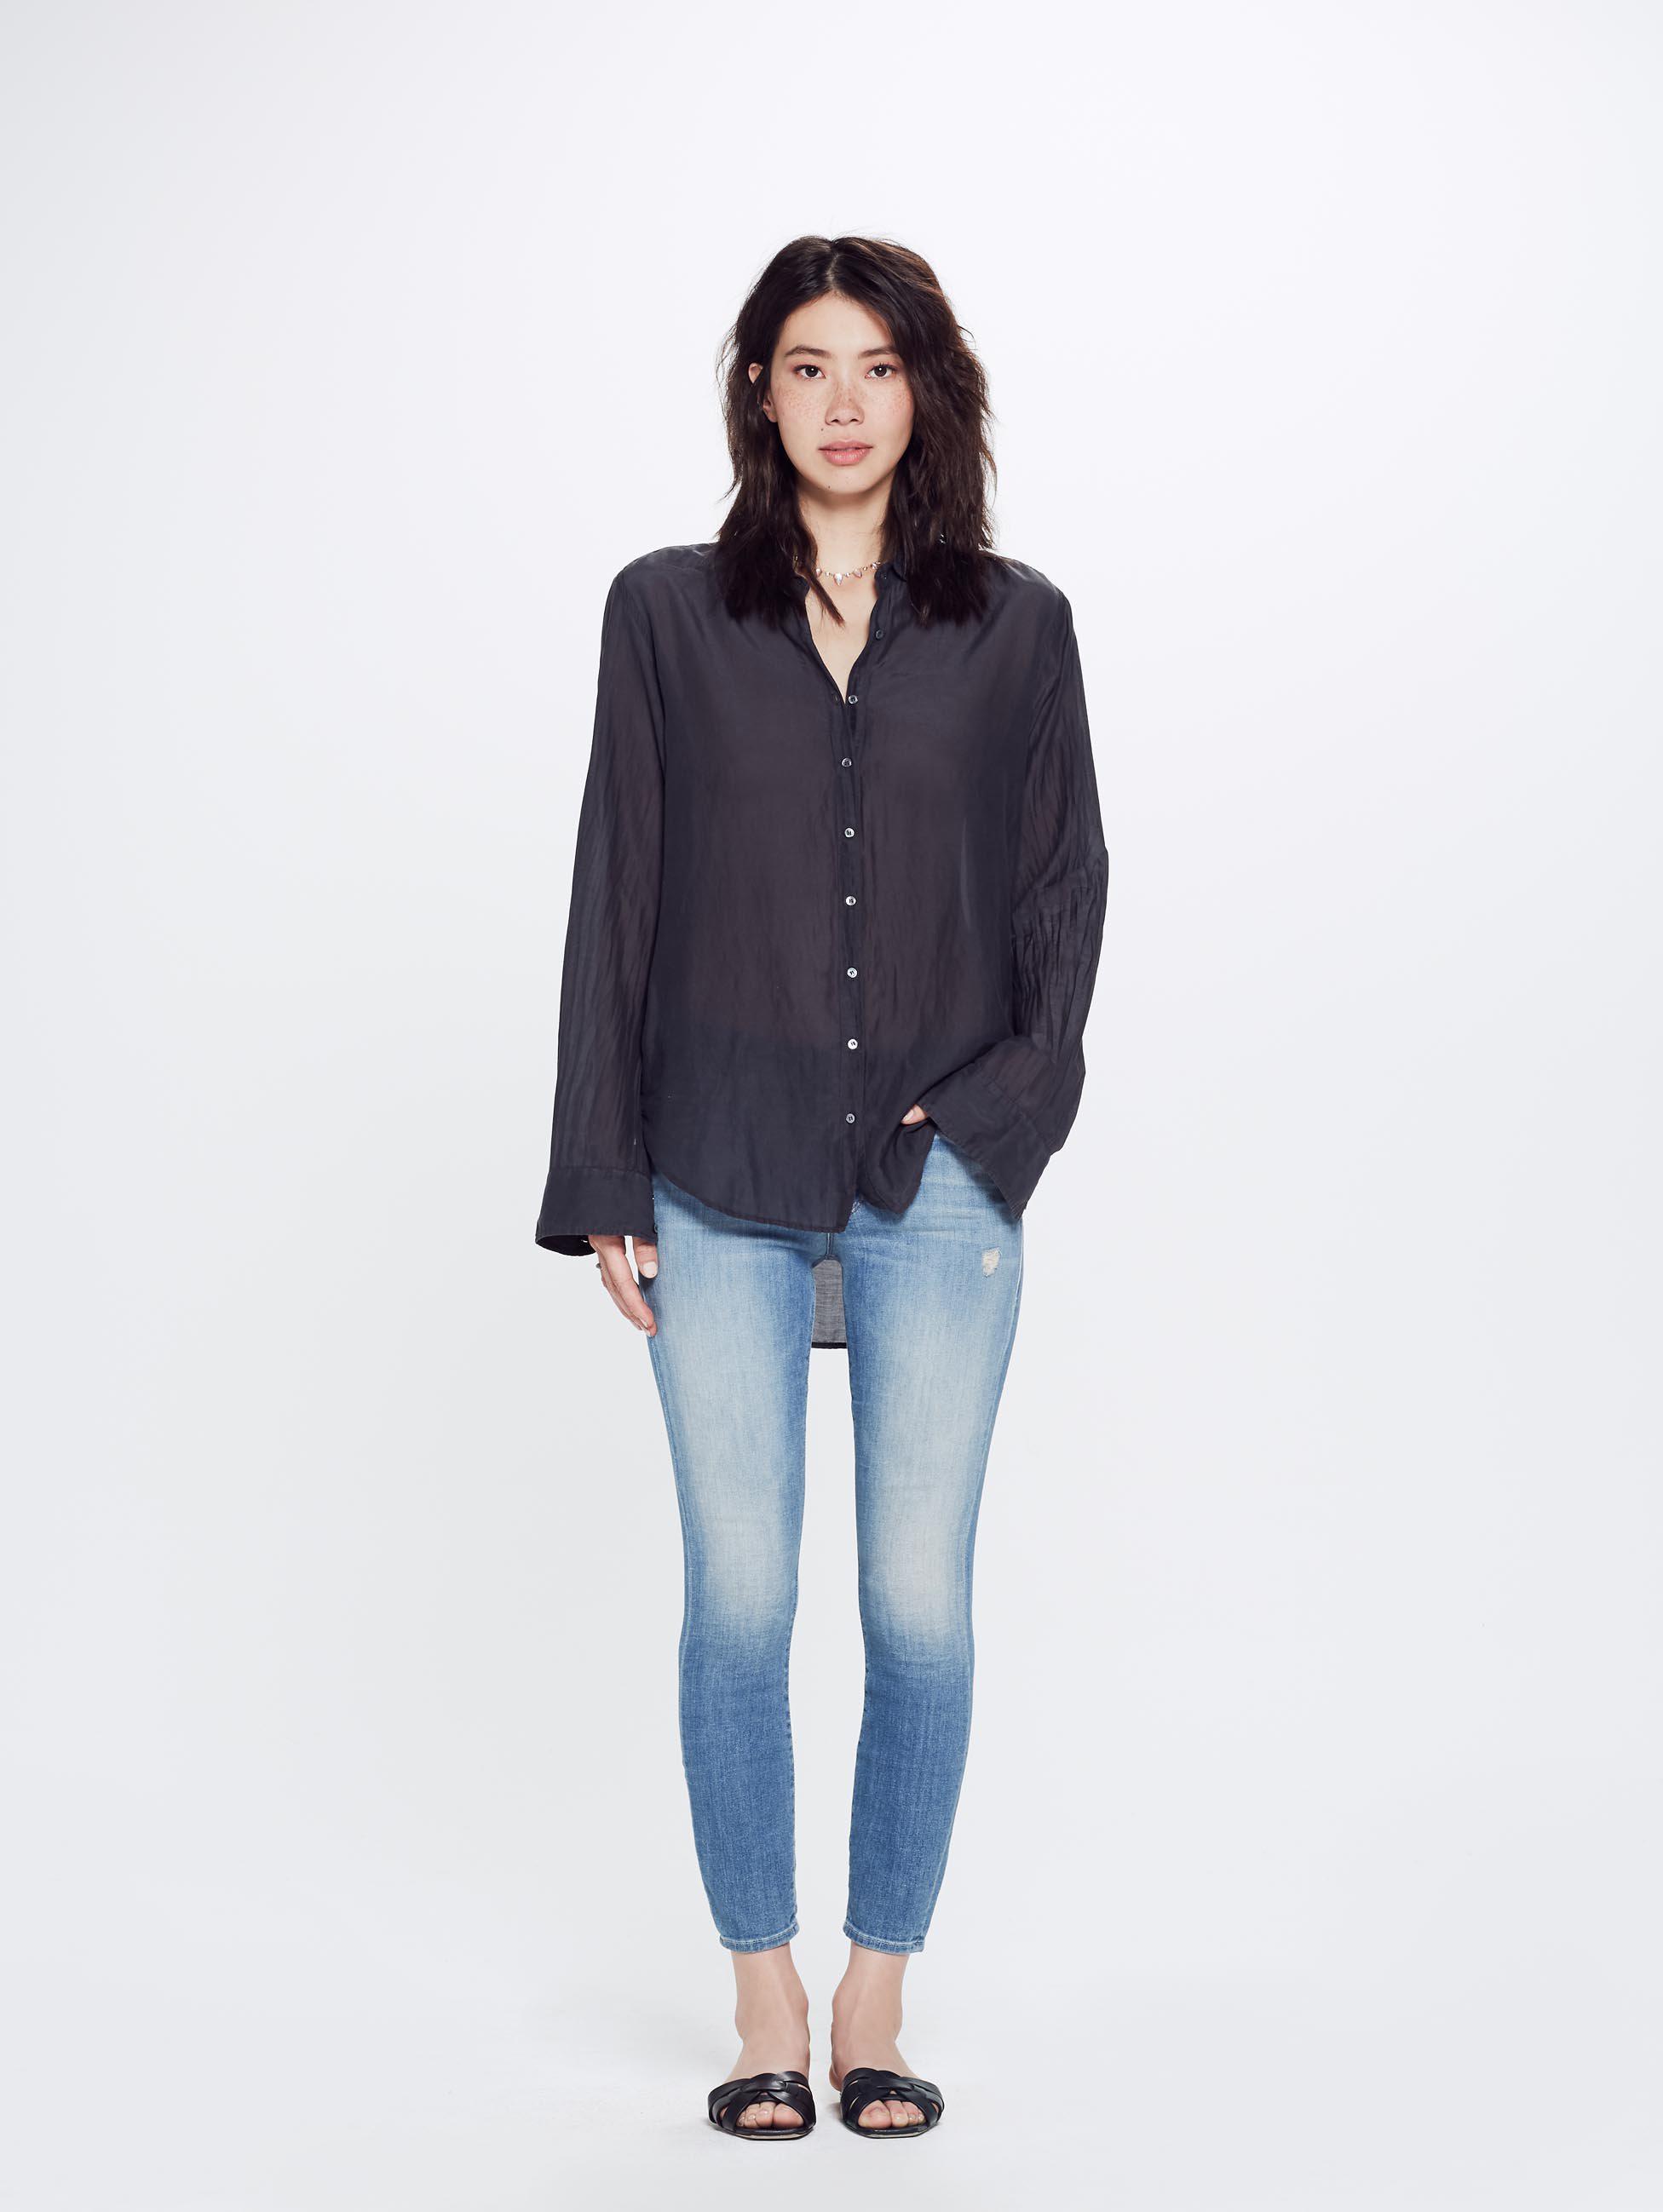 fd02664622cad Xirena Beau Gypset Calliope Silk Cotton Shirt Stormy Gray